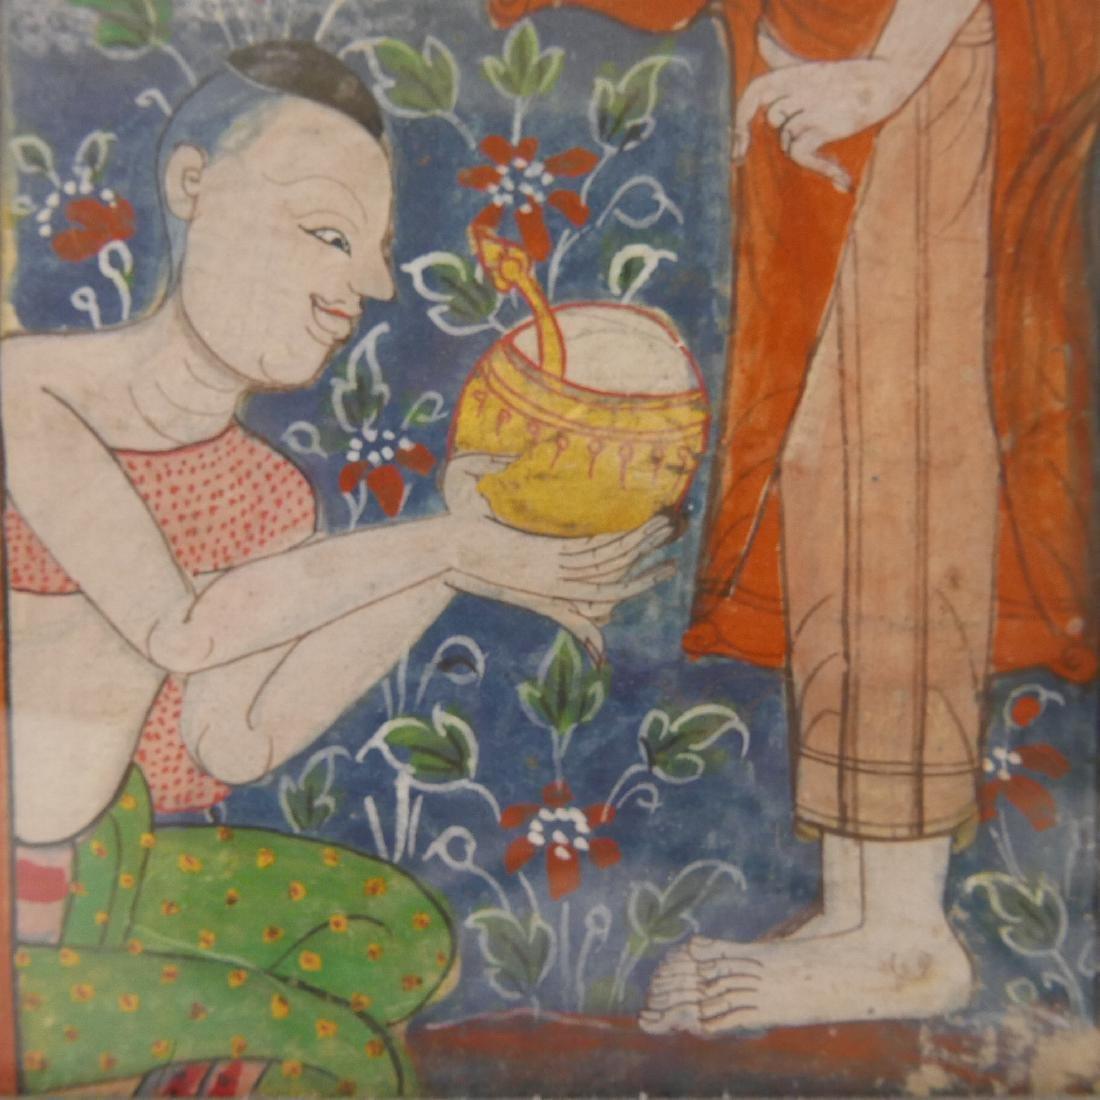 TIBETAN PAINTING OF MONKS - 19TH CENTURY - 4